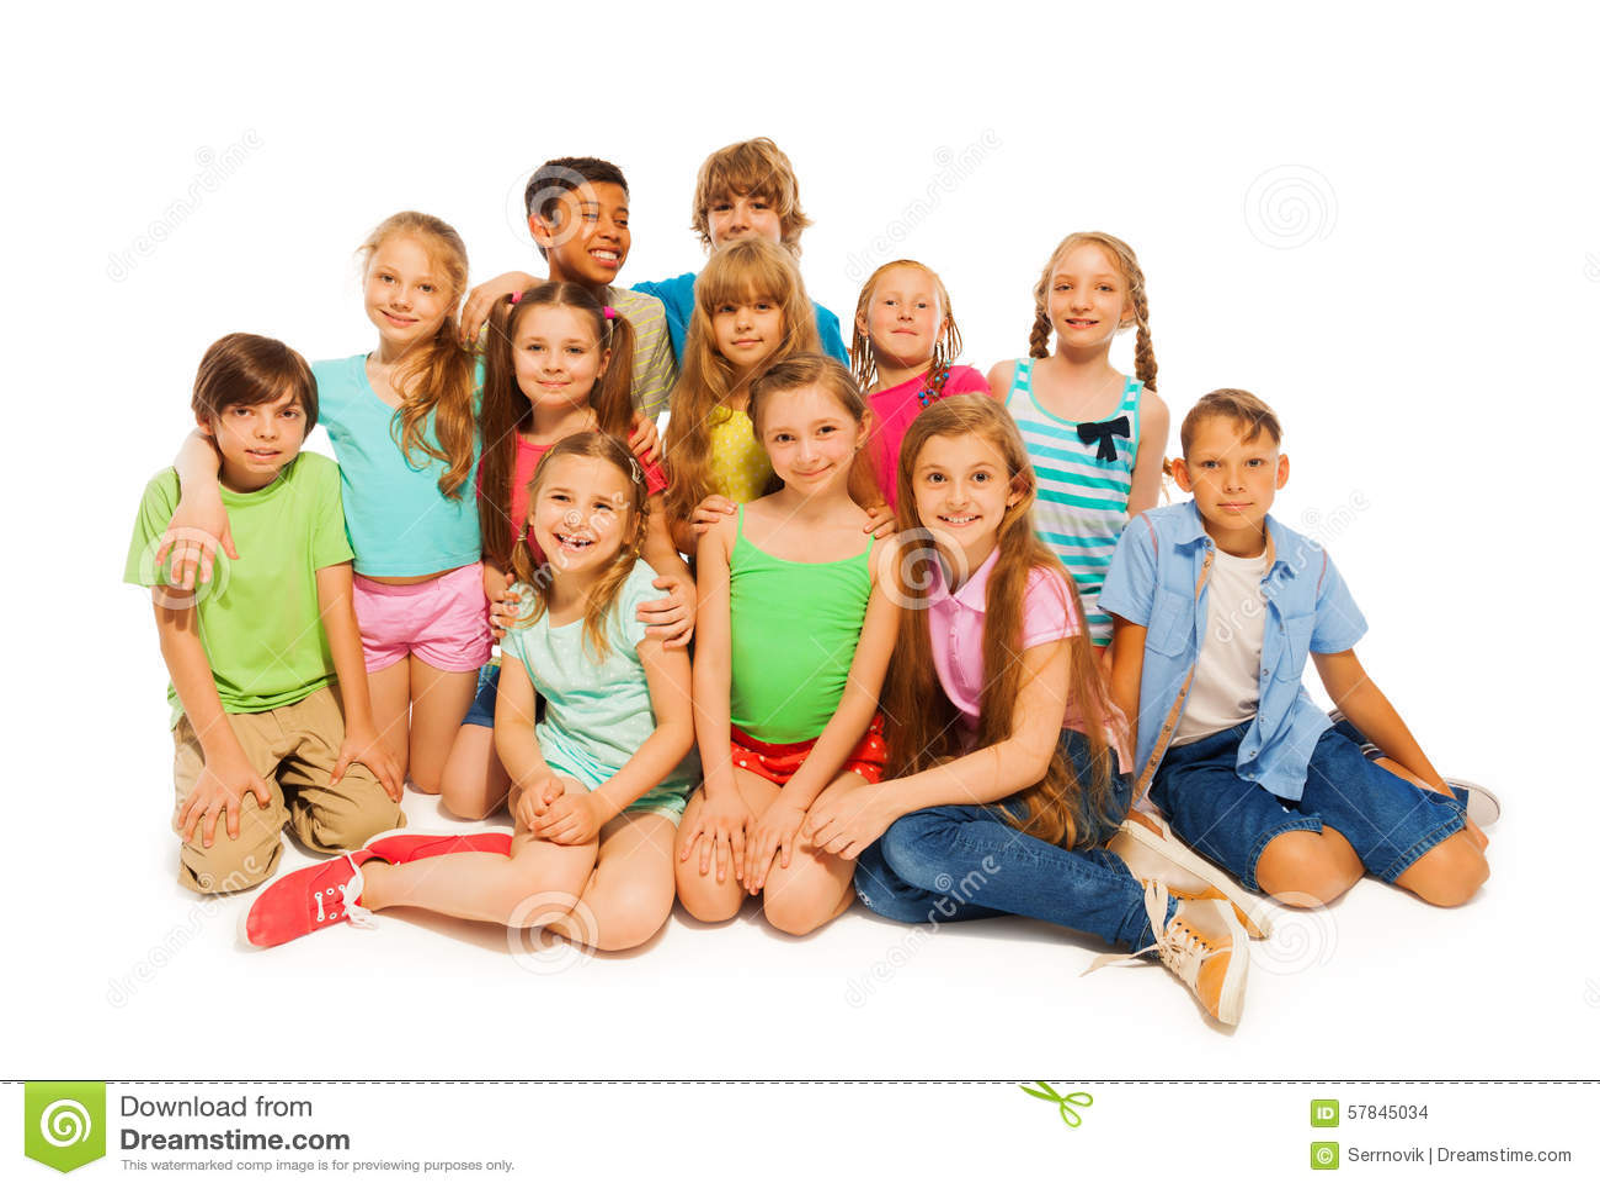 pre teens Group Portrait Of Cute Preteens Stock Photo